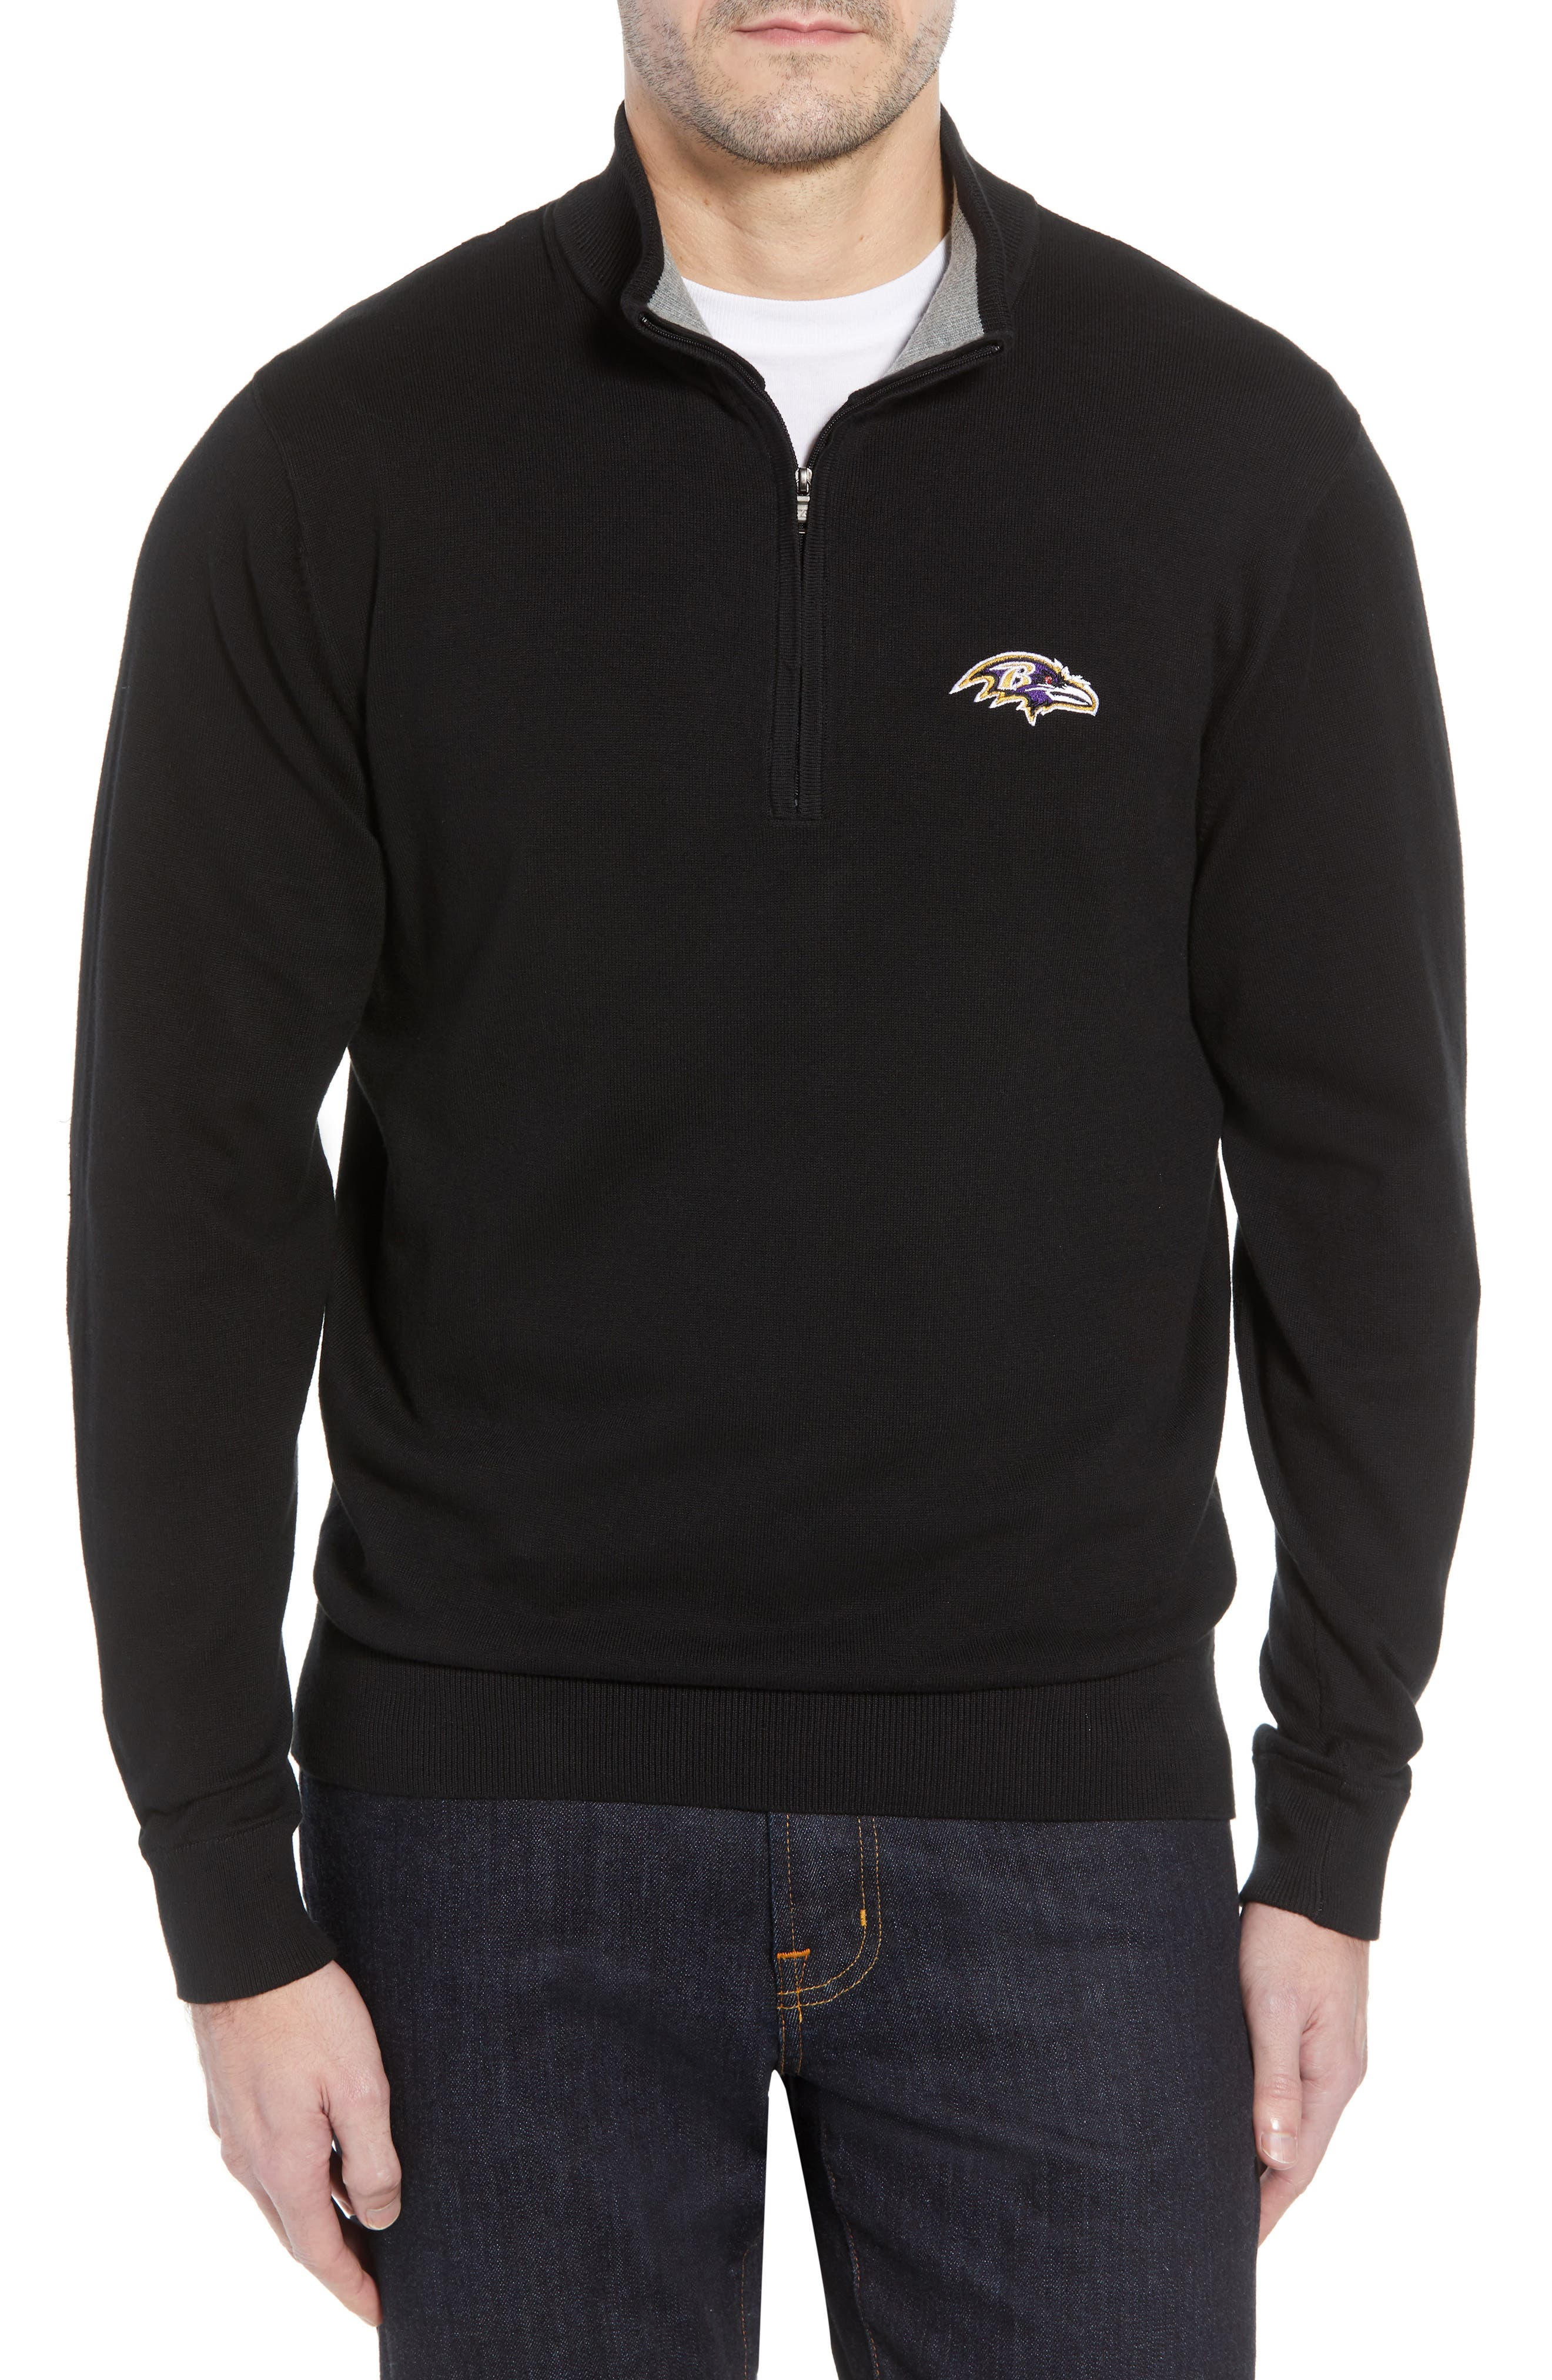 Baltimore Ravens - Lakemont Regular Fit Quarter Zip Sweater,                             Main thumbnail 1, color,                             BLACK